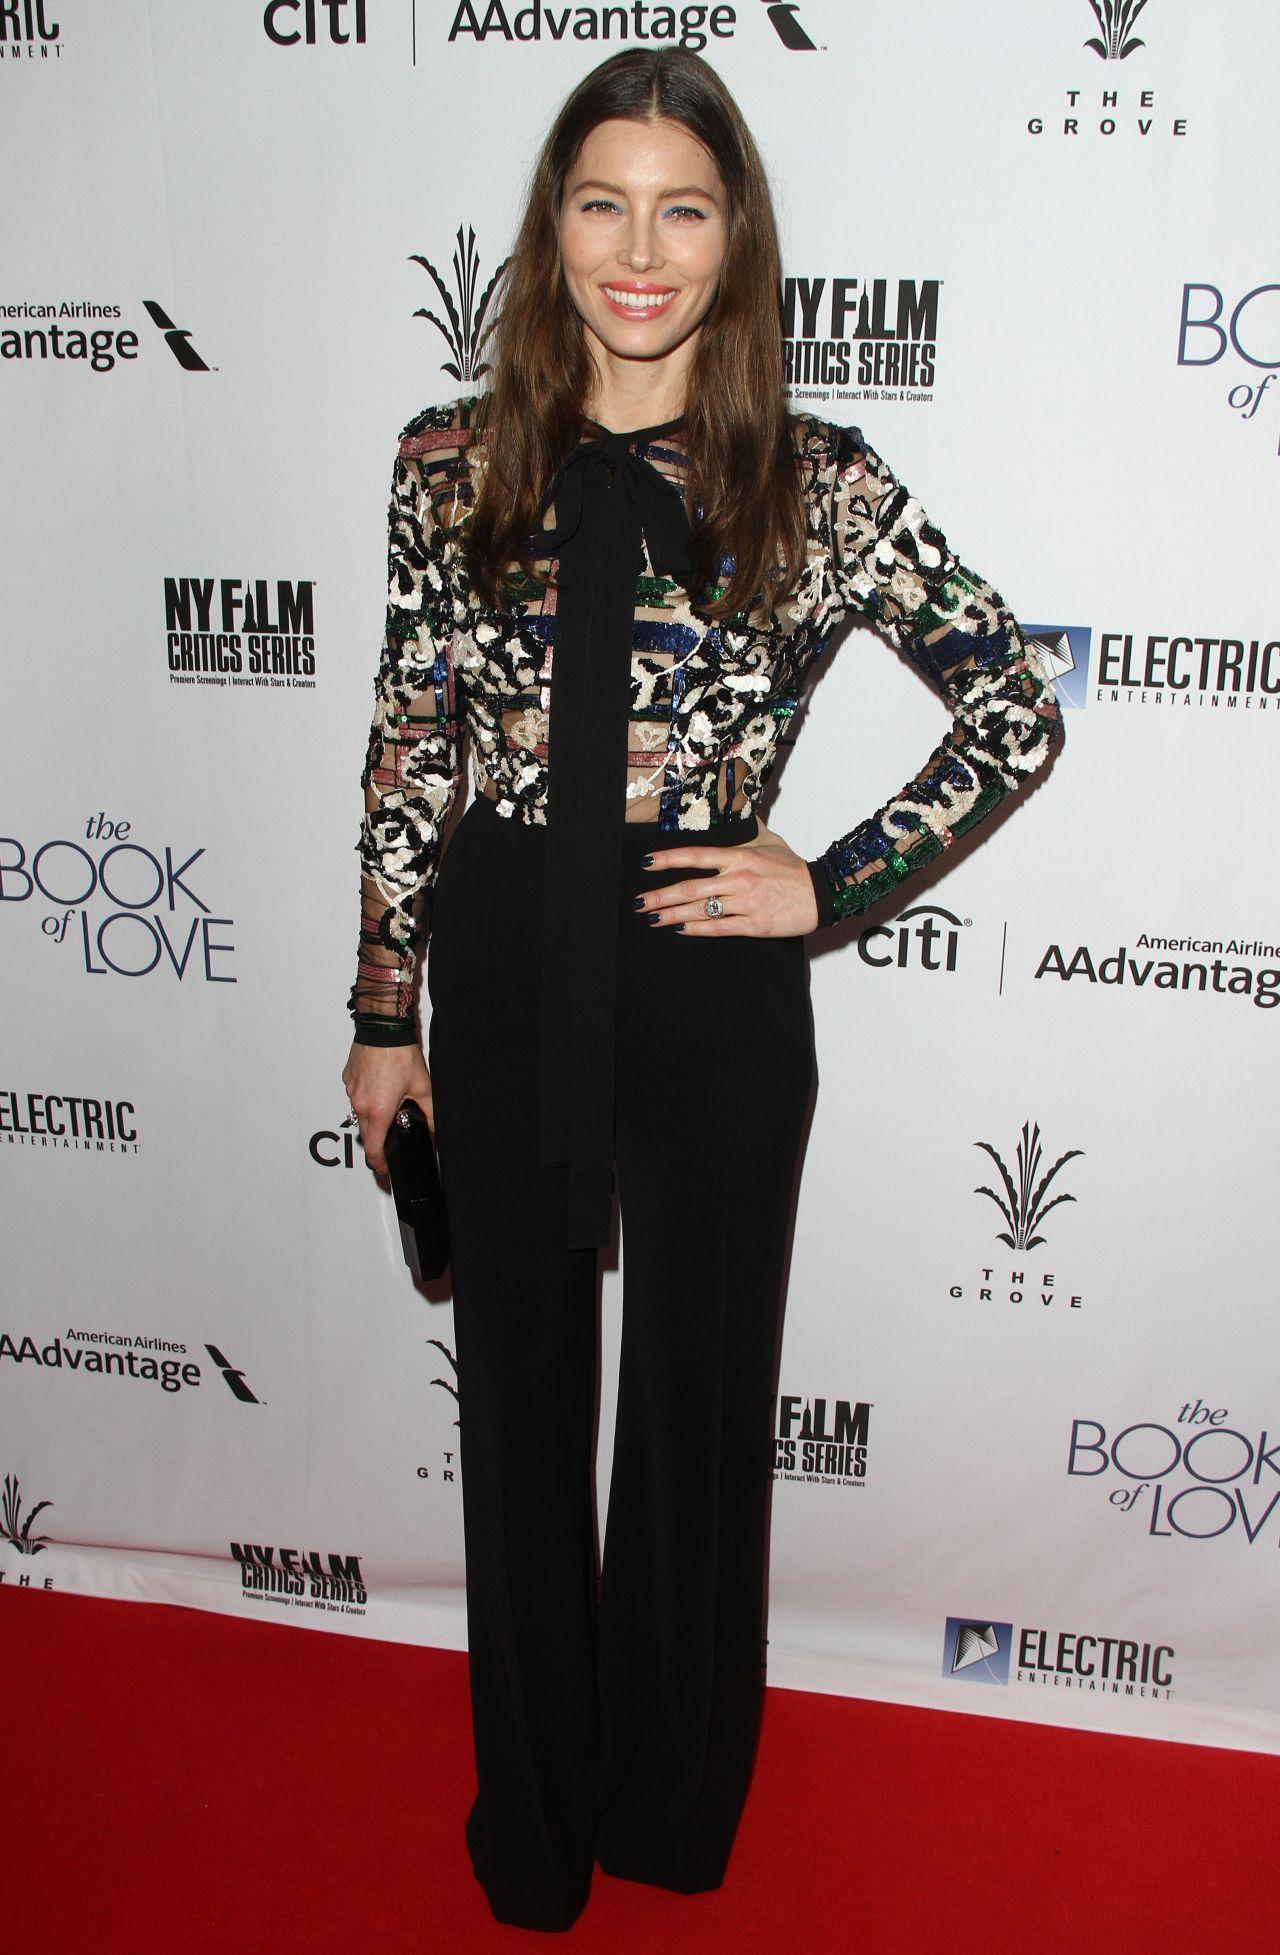 Jessica Biel Book of Love Premiere